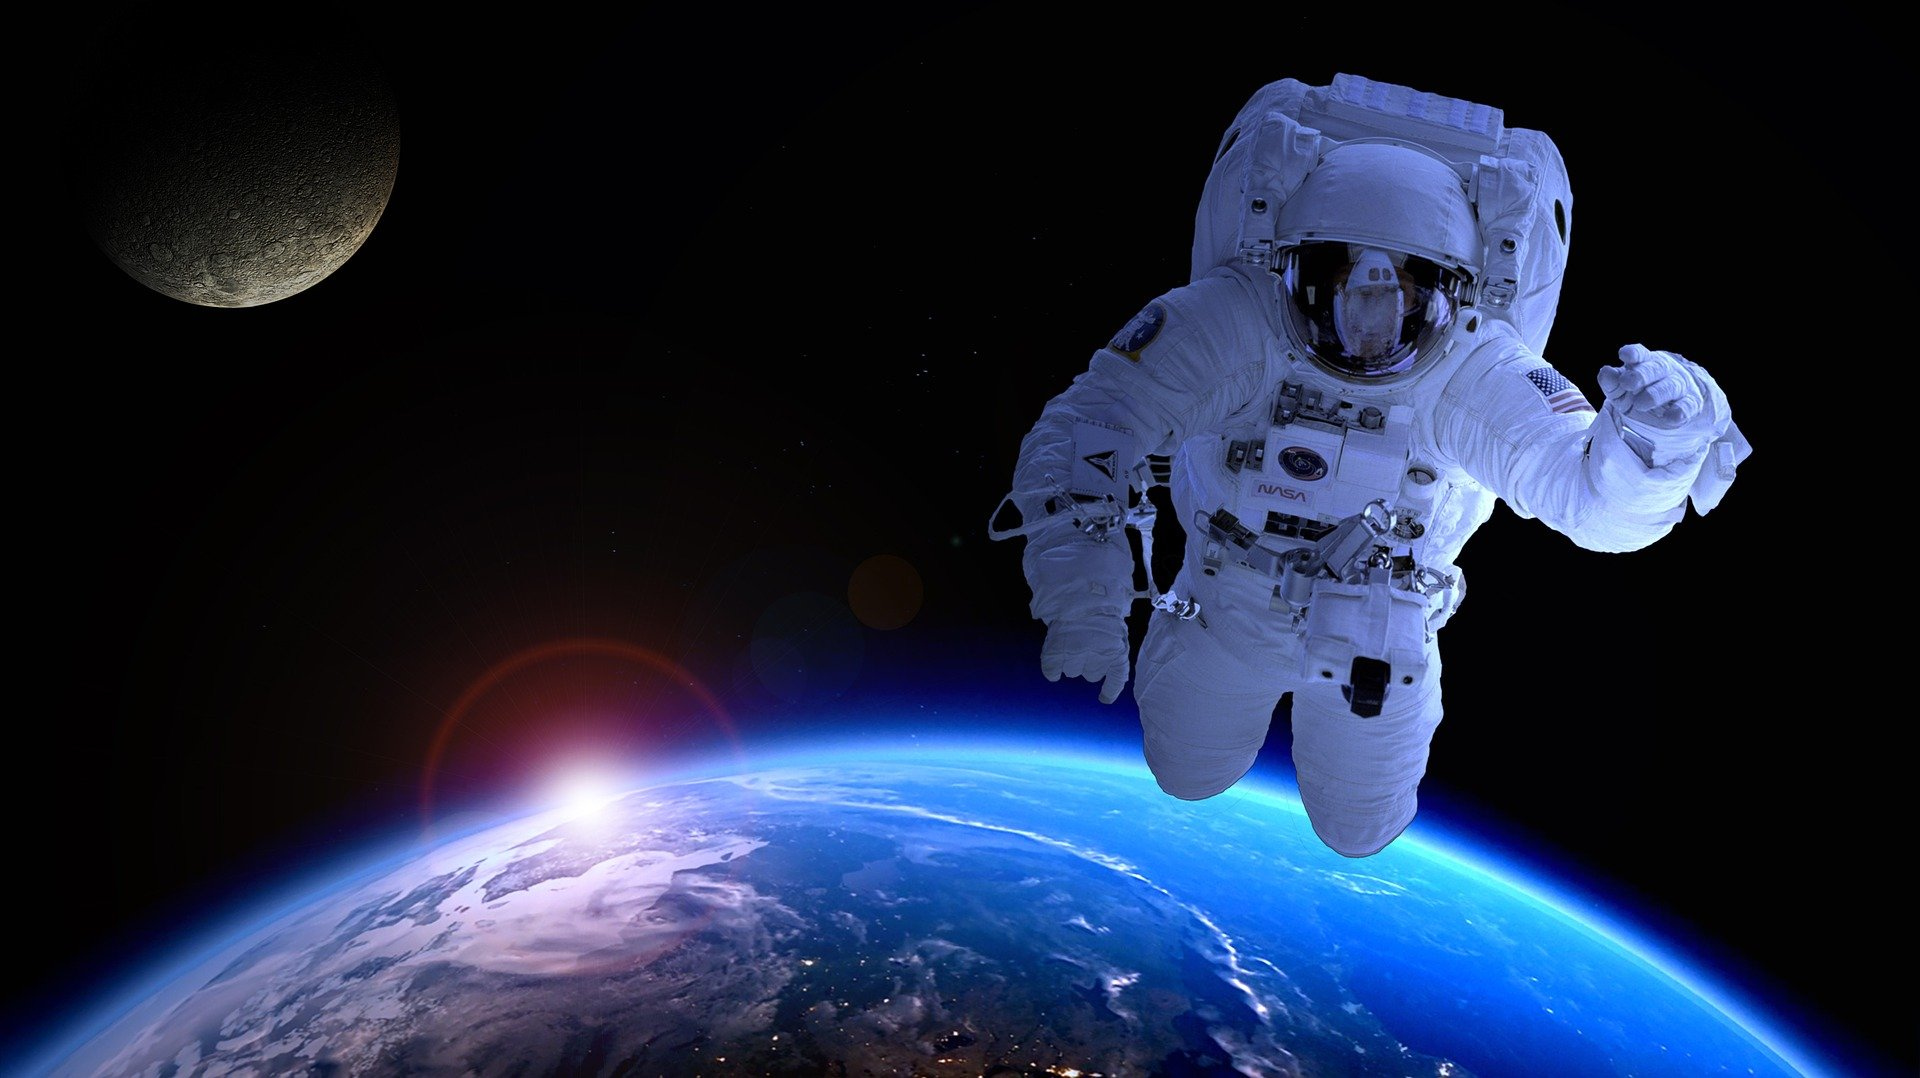 astronaut-1849402_1920